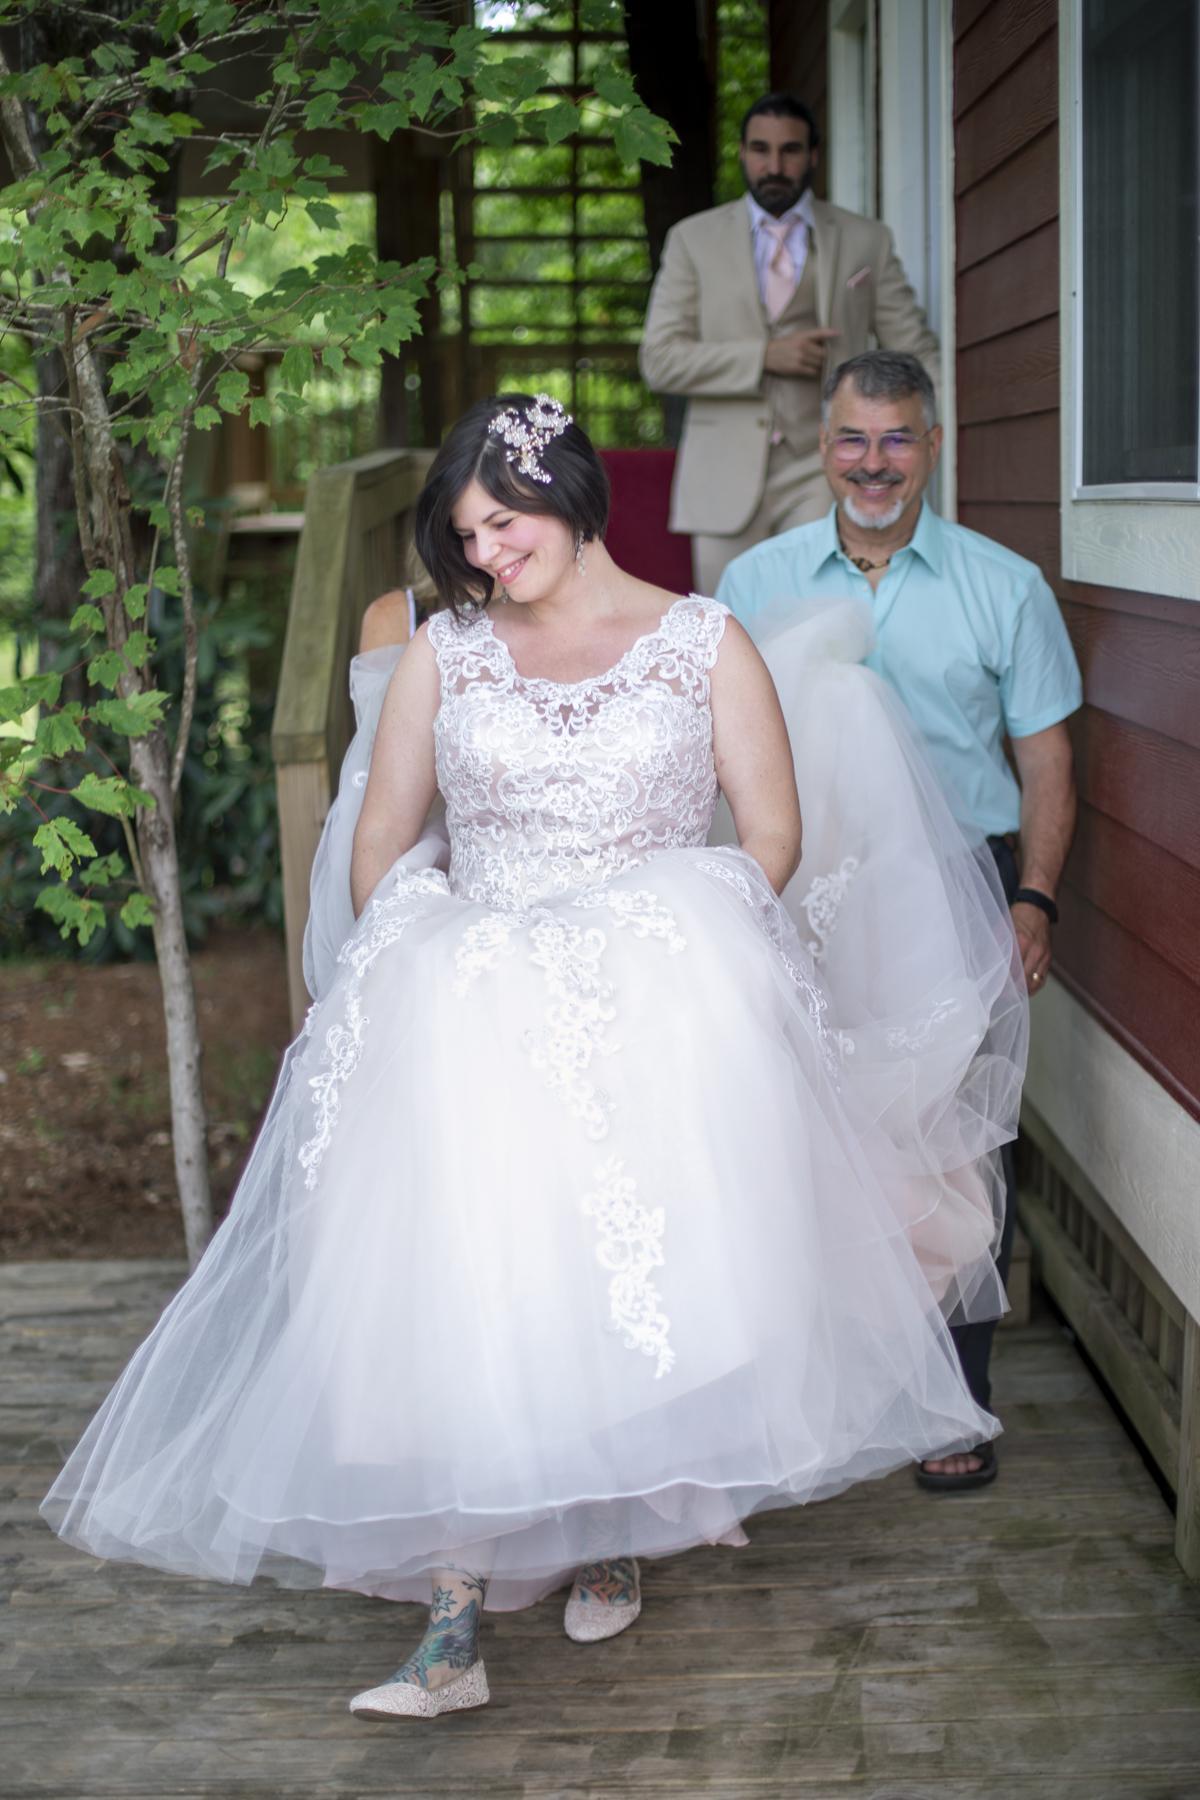 Avyanna and Phoenix Wedding 2019_photos by Studio Misha_BLOG-76.jpg